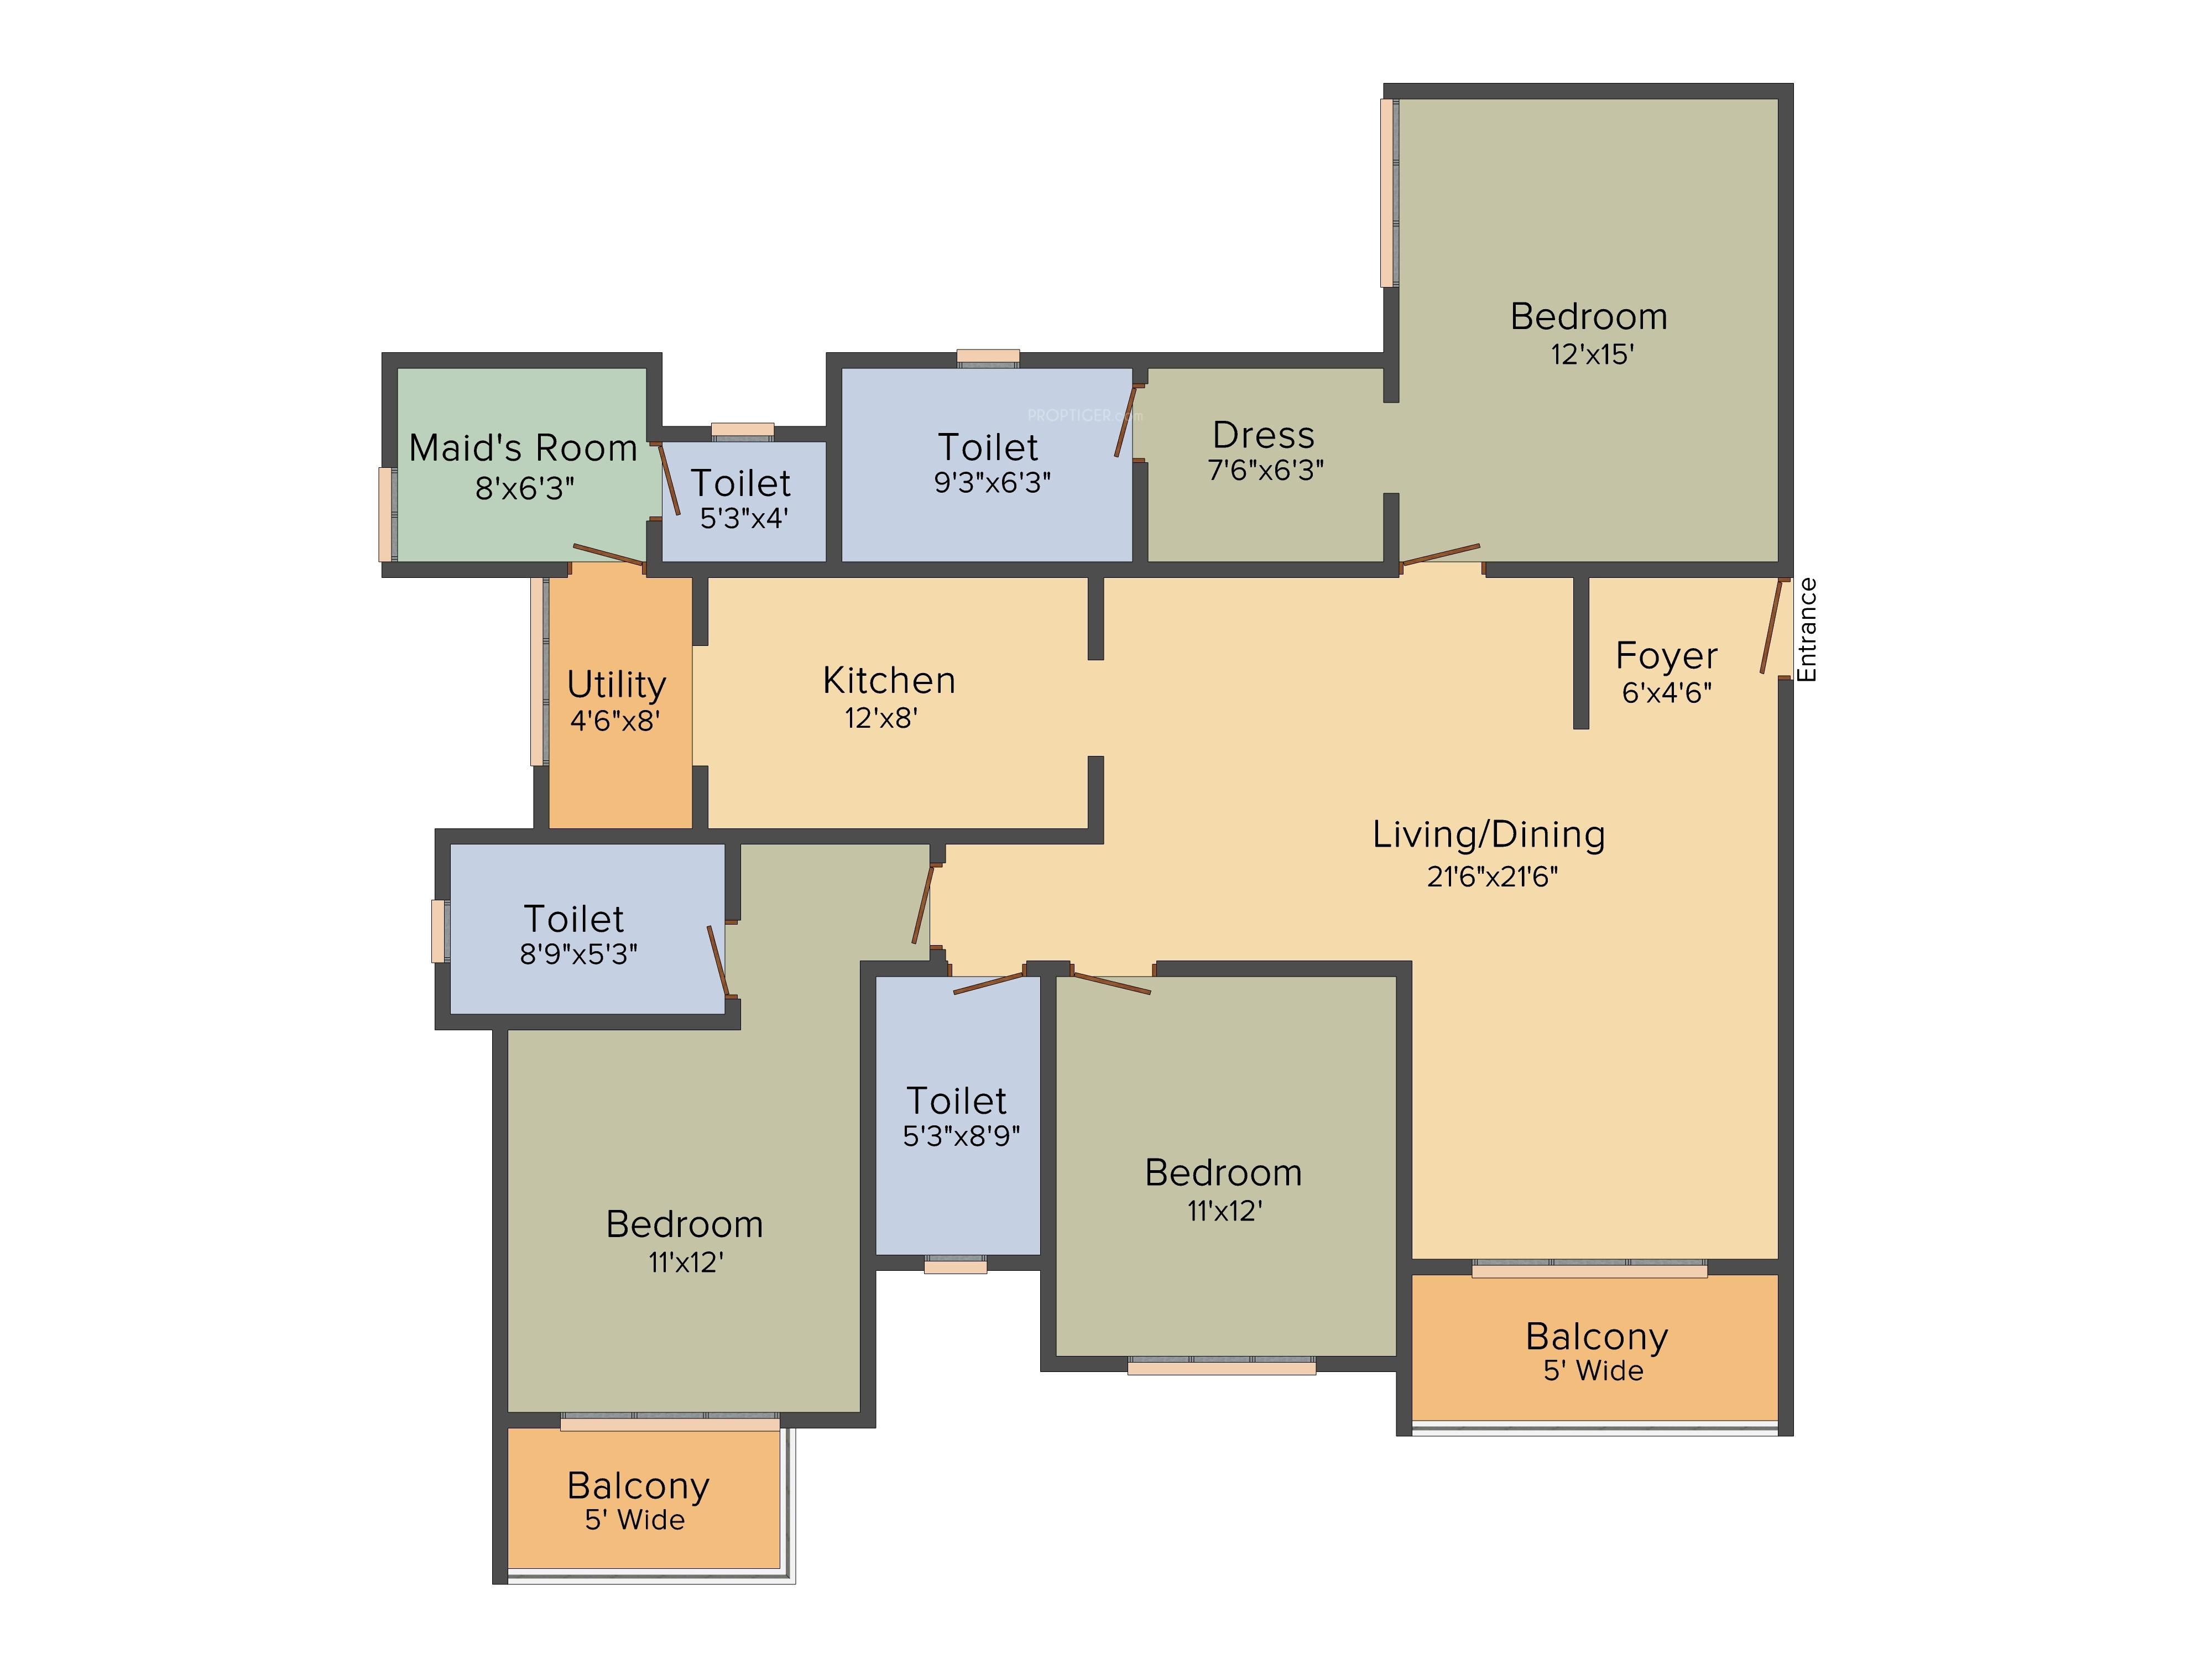 House Floor Plans 3 Bedroom 2 Bath Electrical Plan Best Wiring Diagram For Dummies 1 Bhk Explained Diagrams